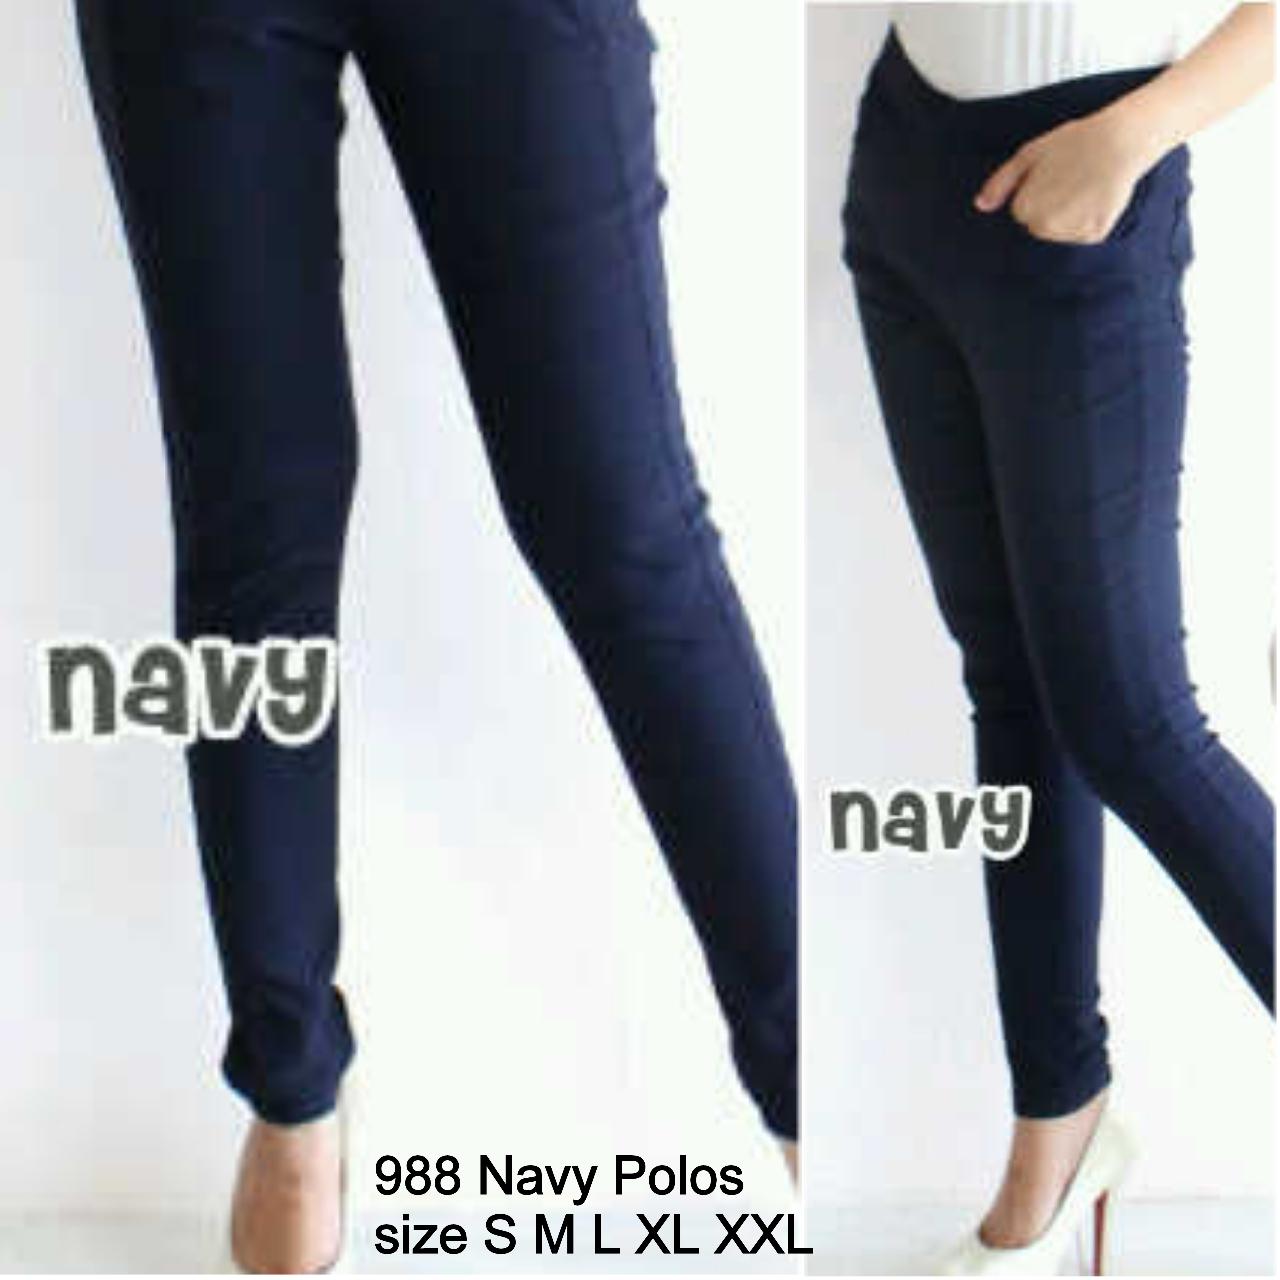 Buy Bestsellercelana Skinny Soft Jeans High Qualitycelana Wanita Celana Cewek Polos Baggy Short Pants Basic Wear